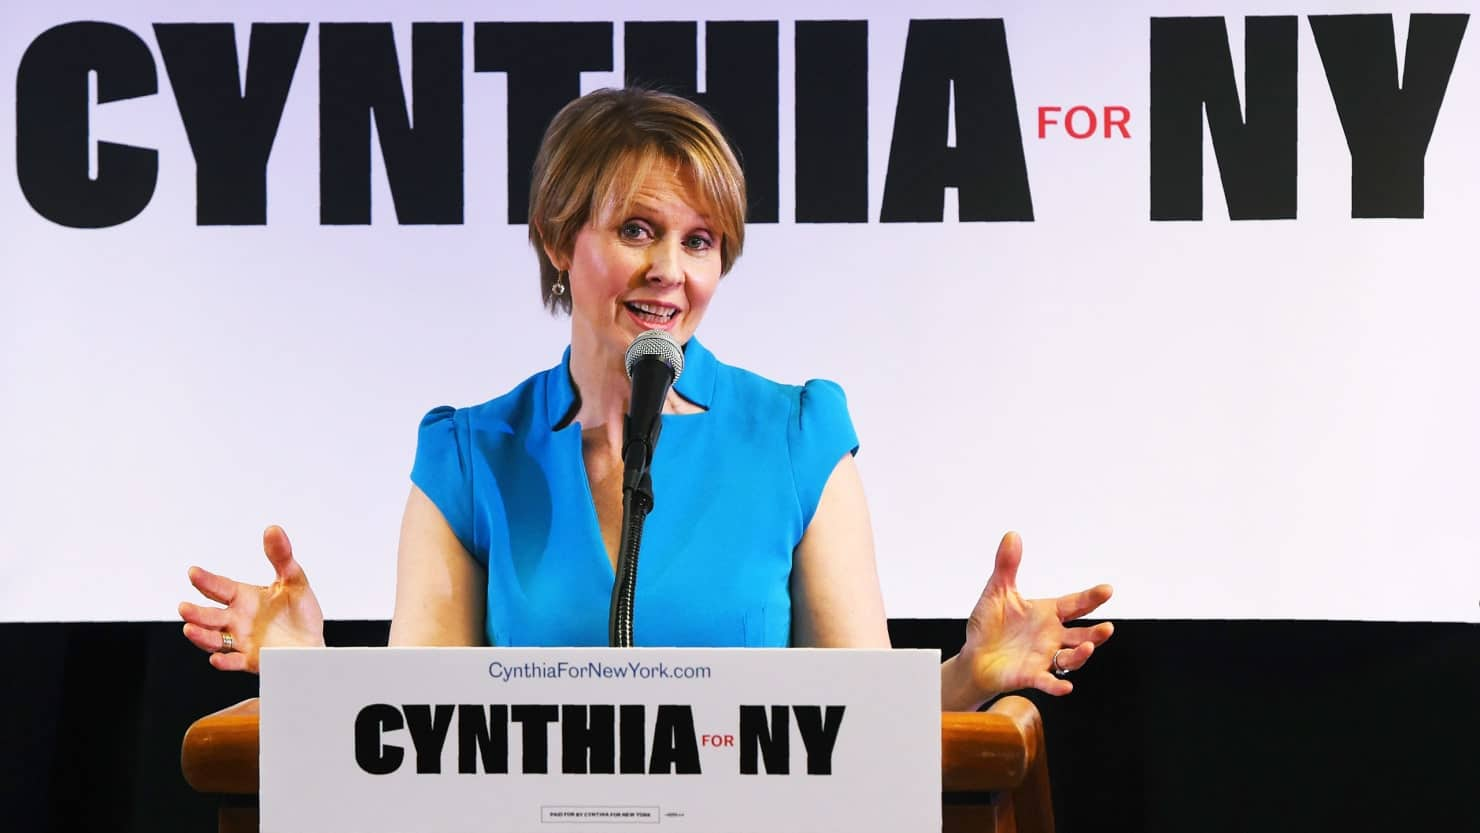 Cynthia Nixon se presenta como candidata a la gubernatura de Nueva York